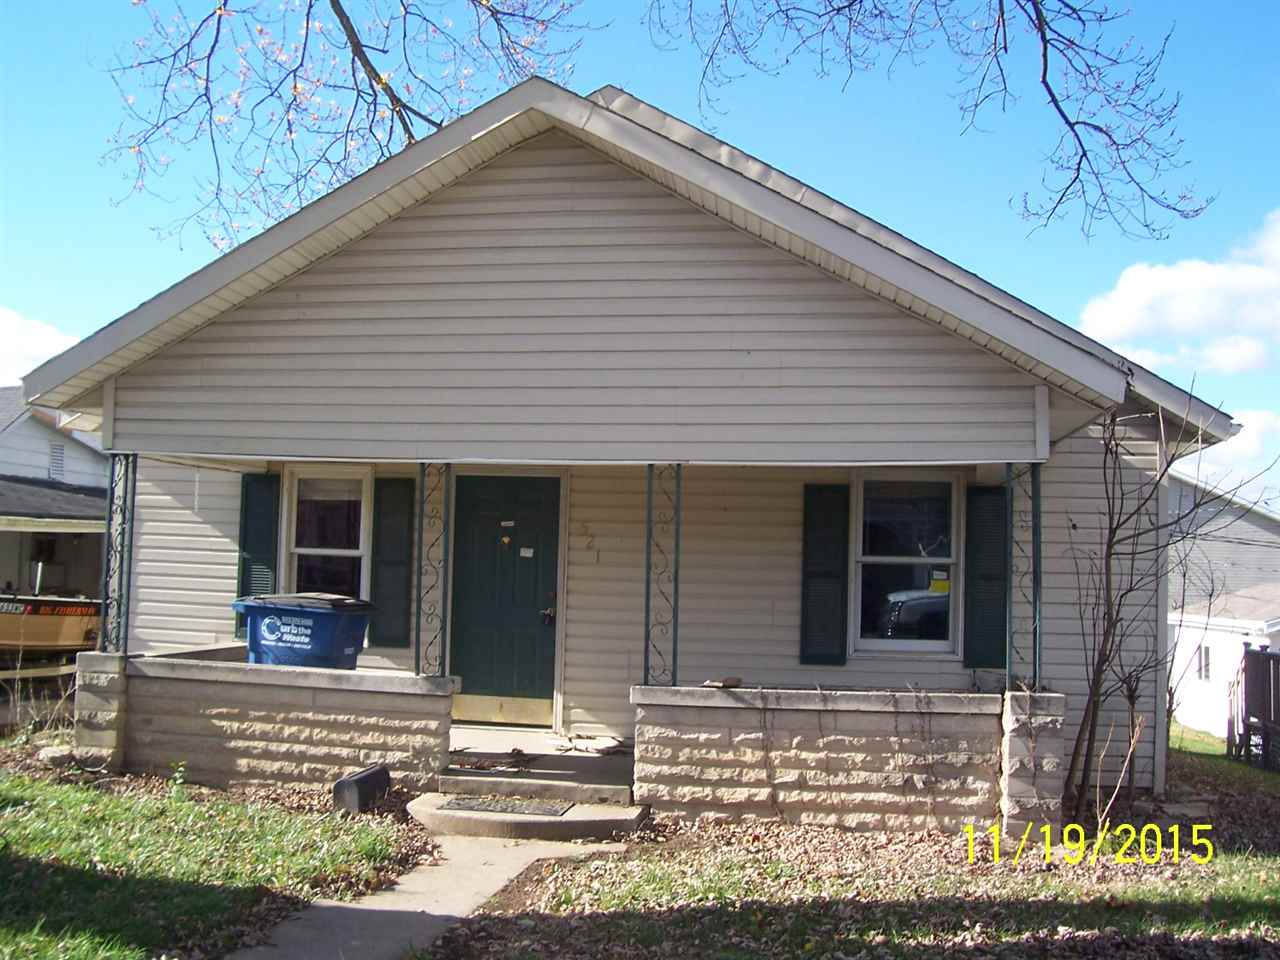 Real Estate for Sale, ListingId: 36755321, Bedford,IN47421